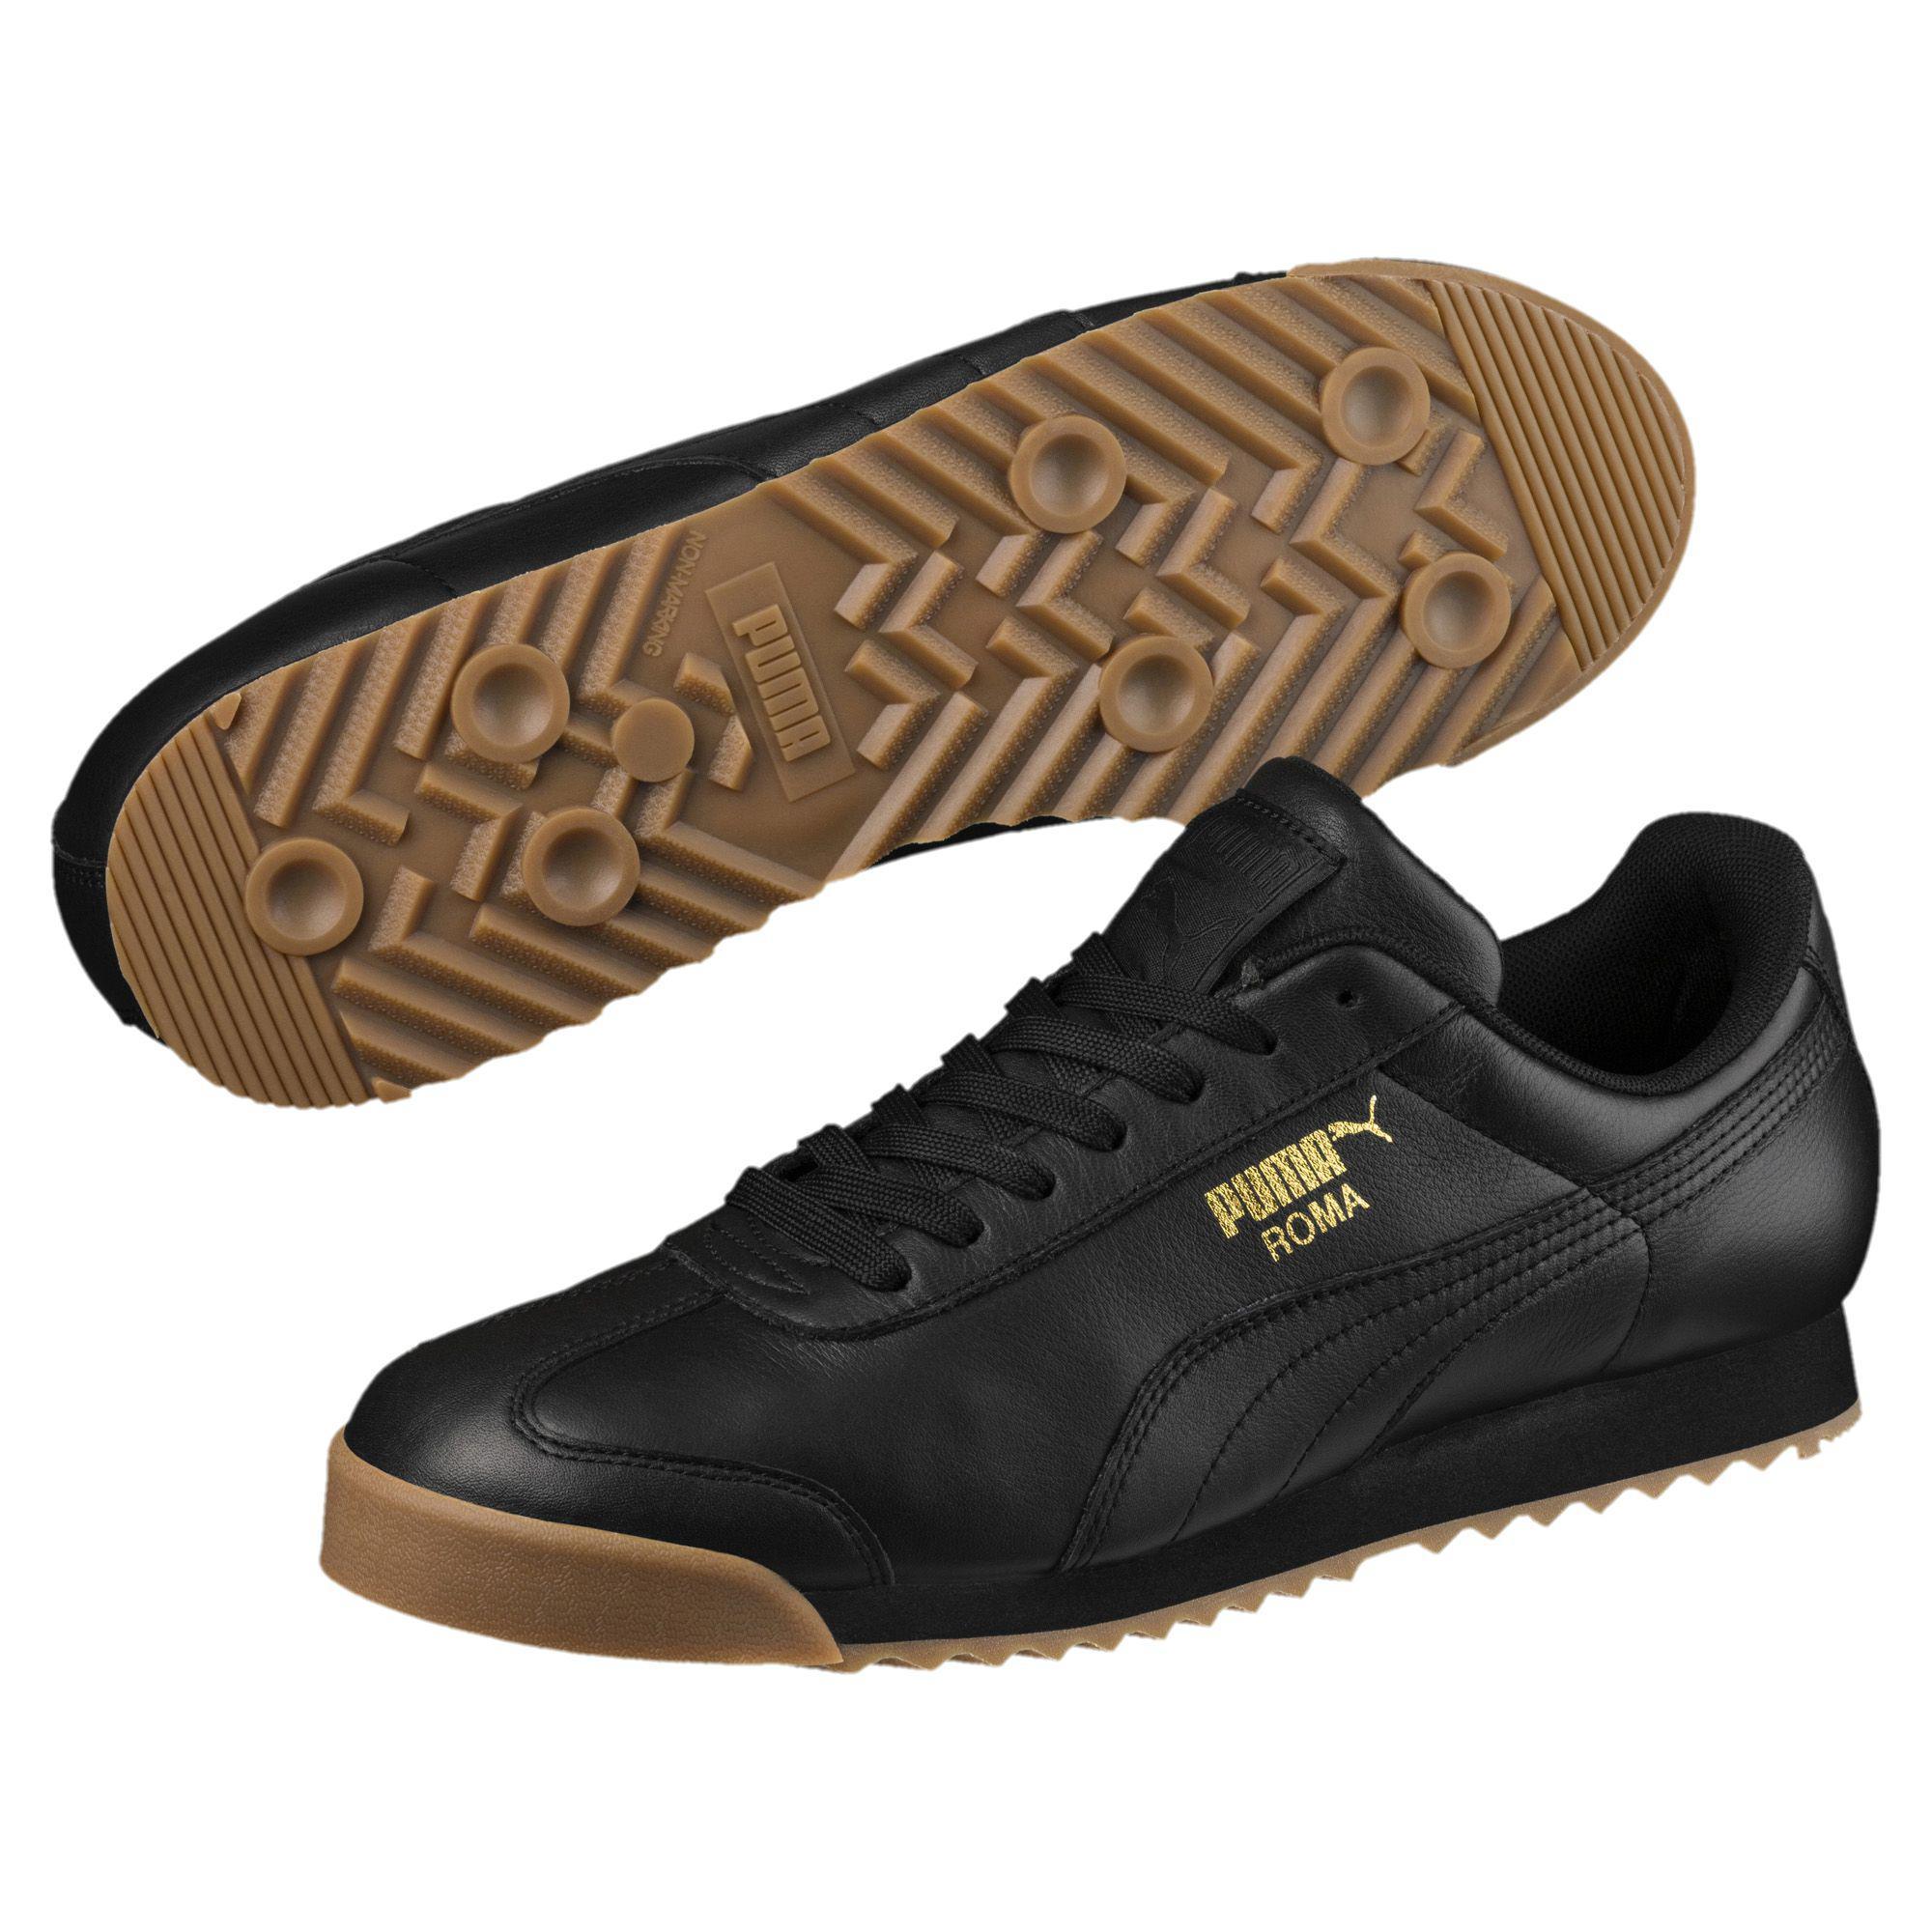 c5f376ca412 PUMA - Black Roma Classic Gum Sneakers for Men - Lyst. View fullscreen